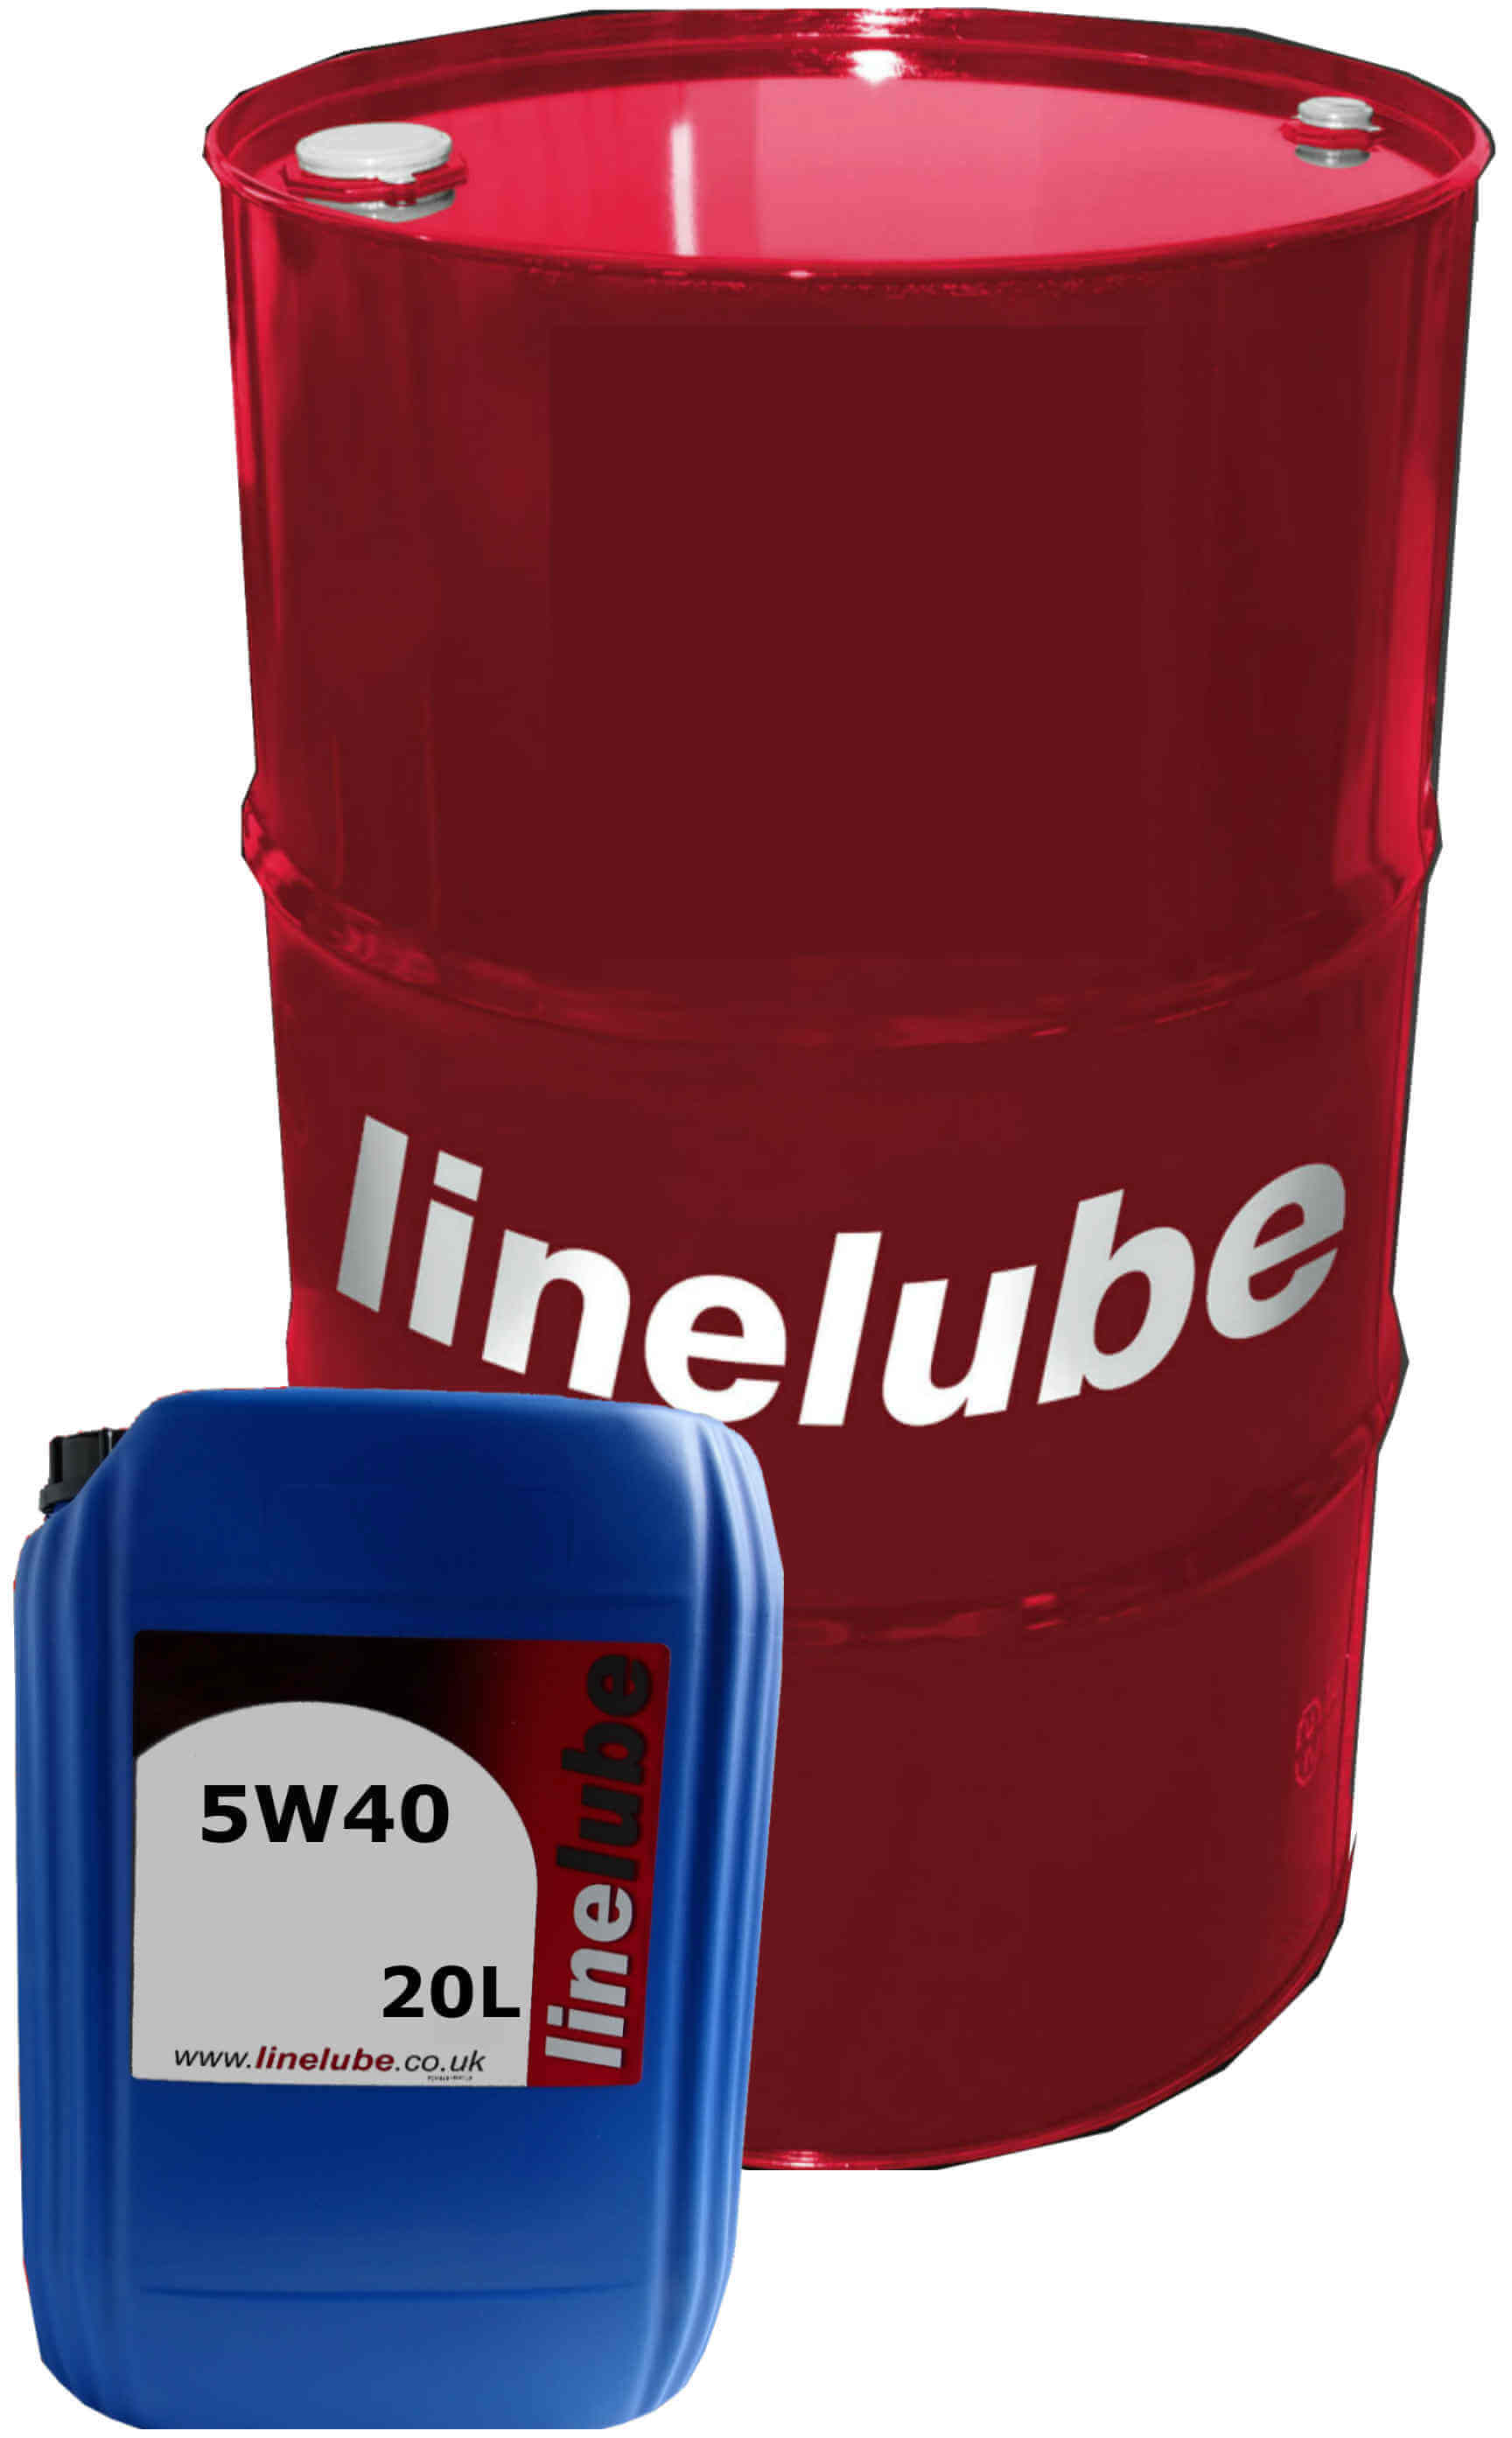 Linelube 5W40